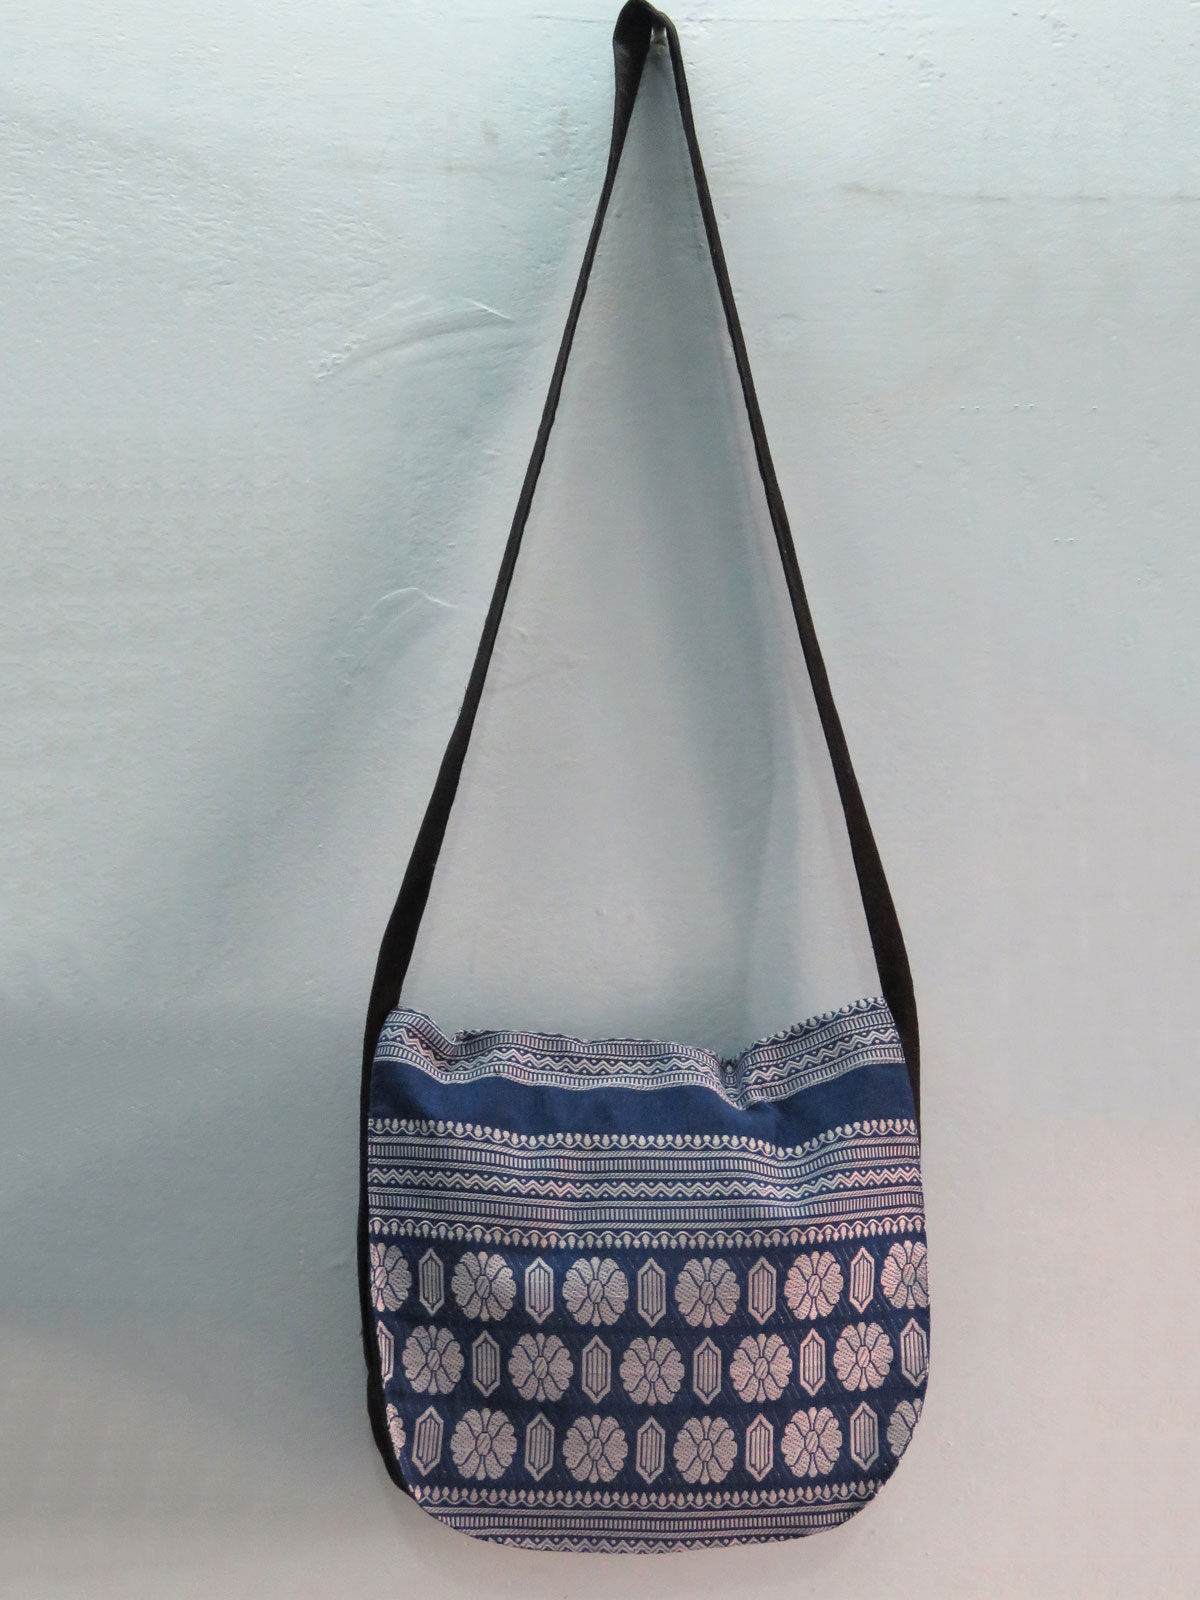 Indigo messenger bag with handwoven design.